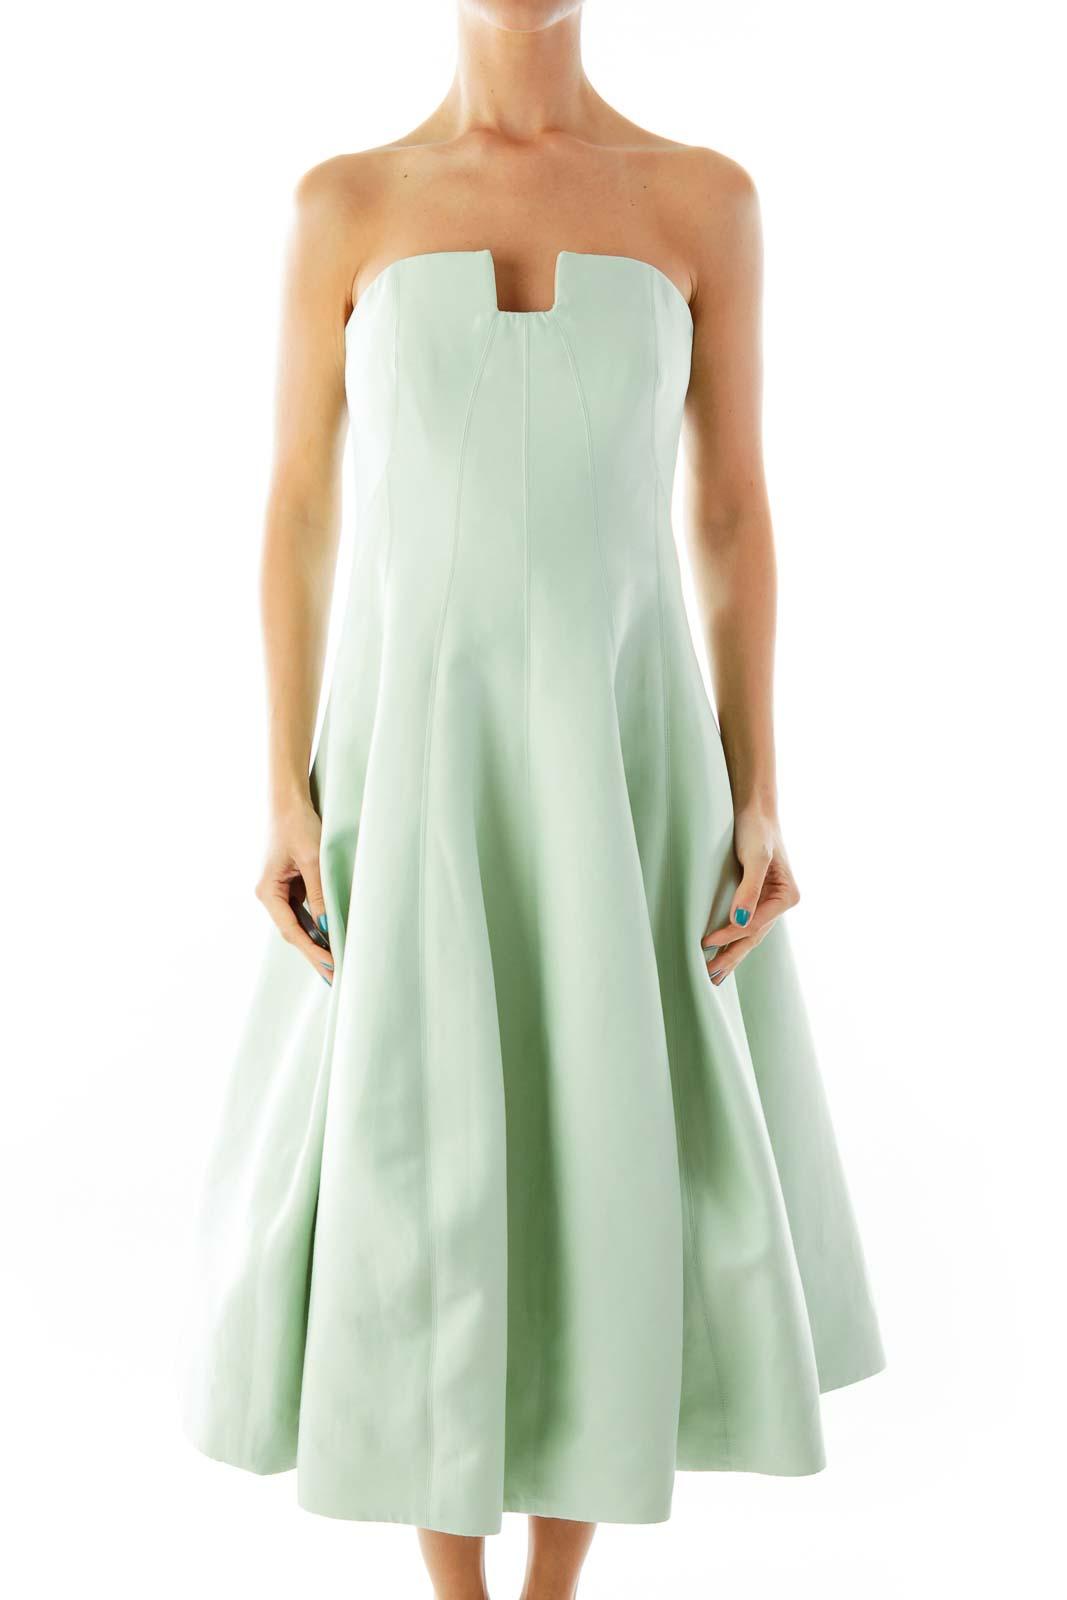 Sea Green Strapless Evening Dress Front